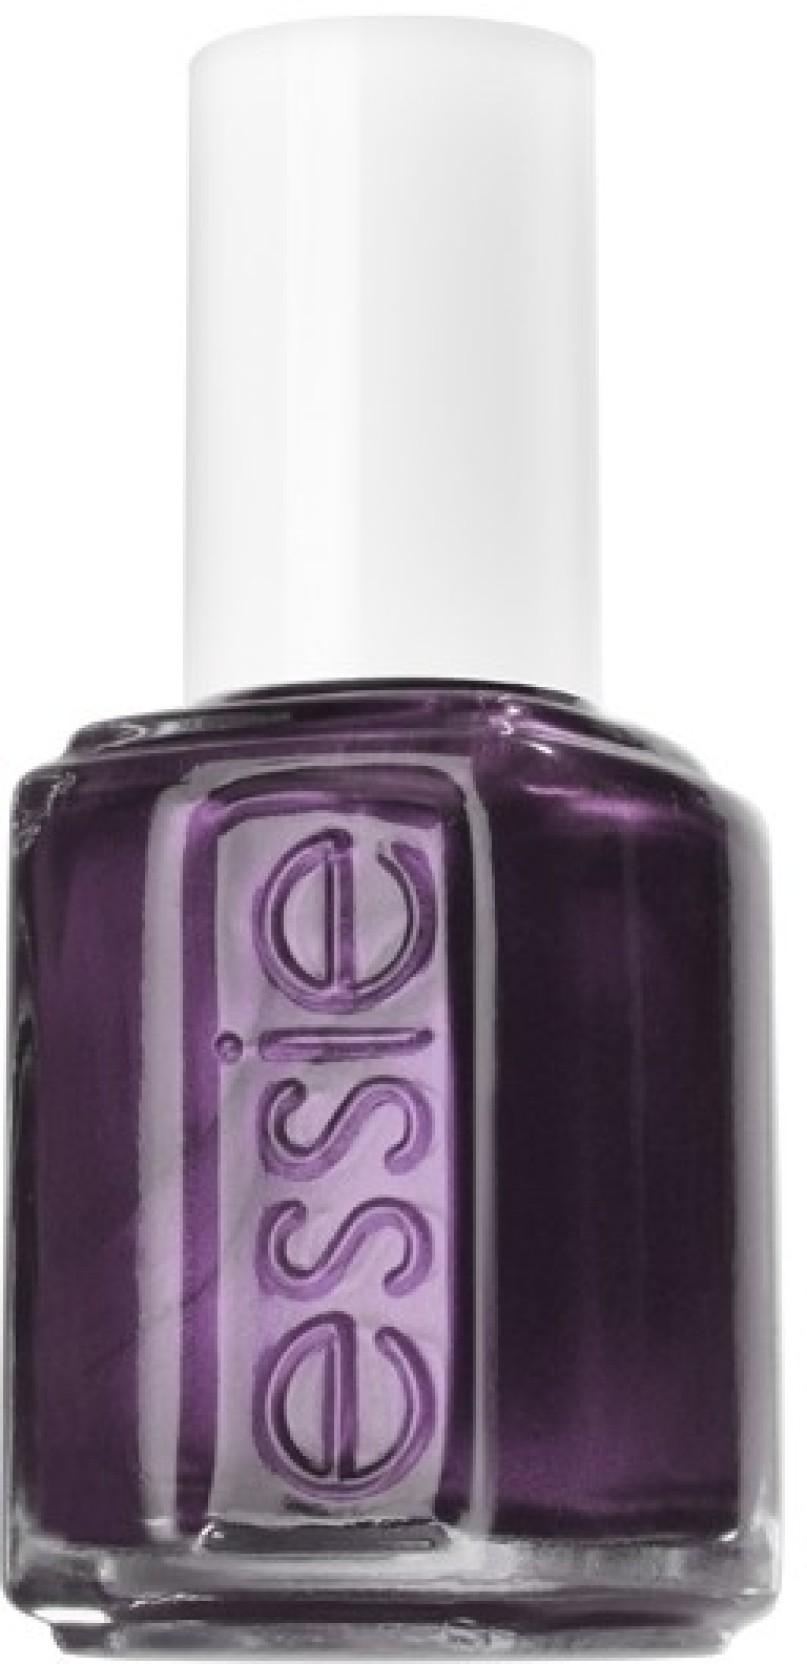 essie Nail Polish Damsel in a Dress - 663 - Price in India, Buy ...